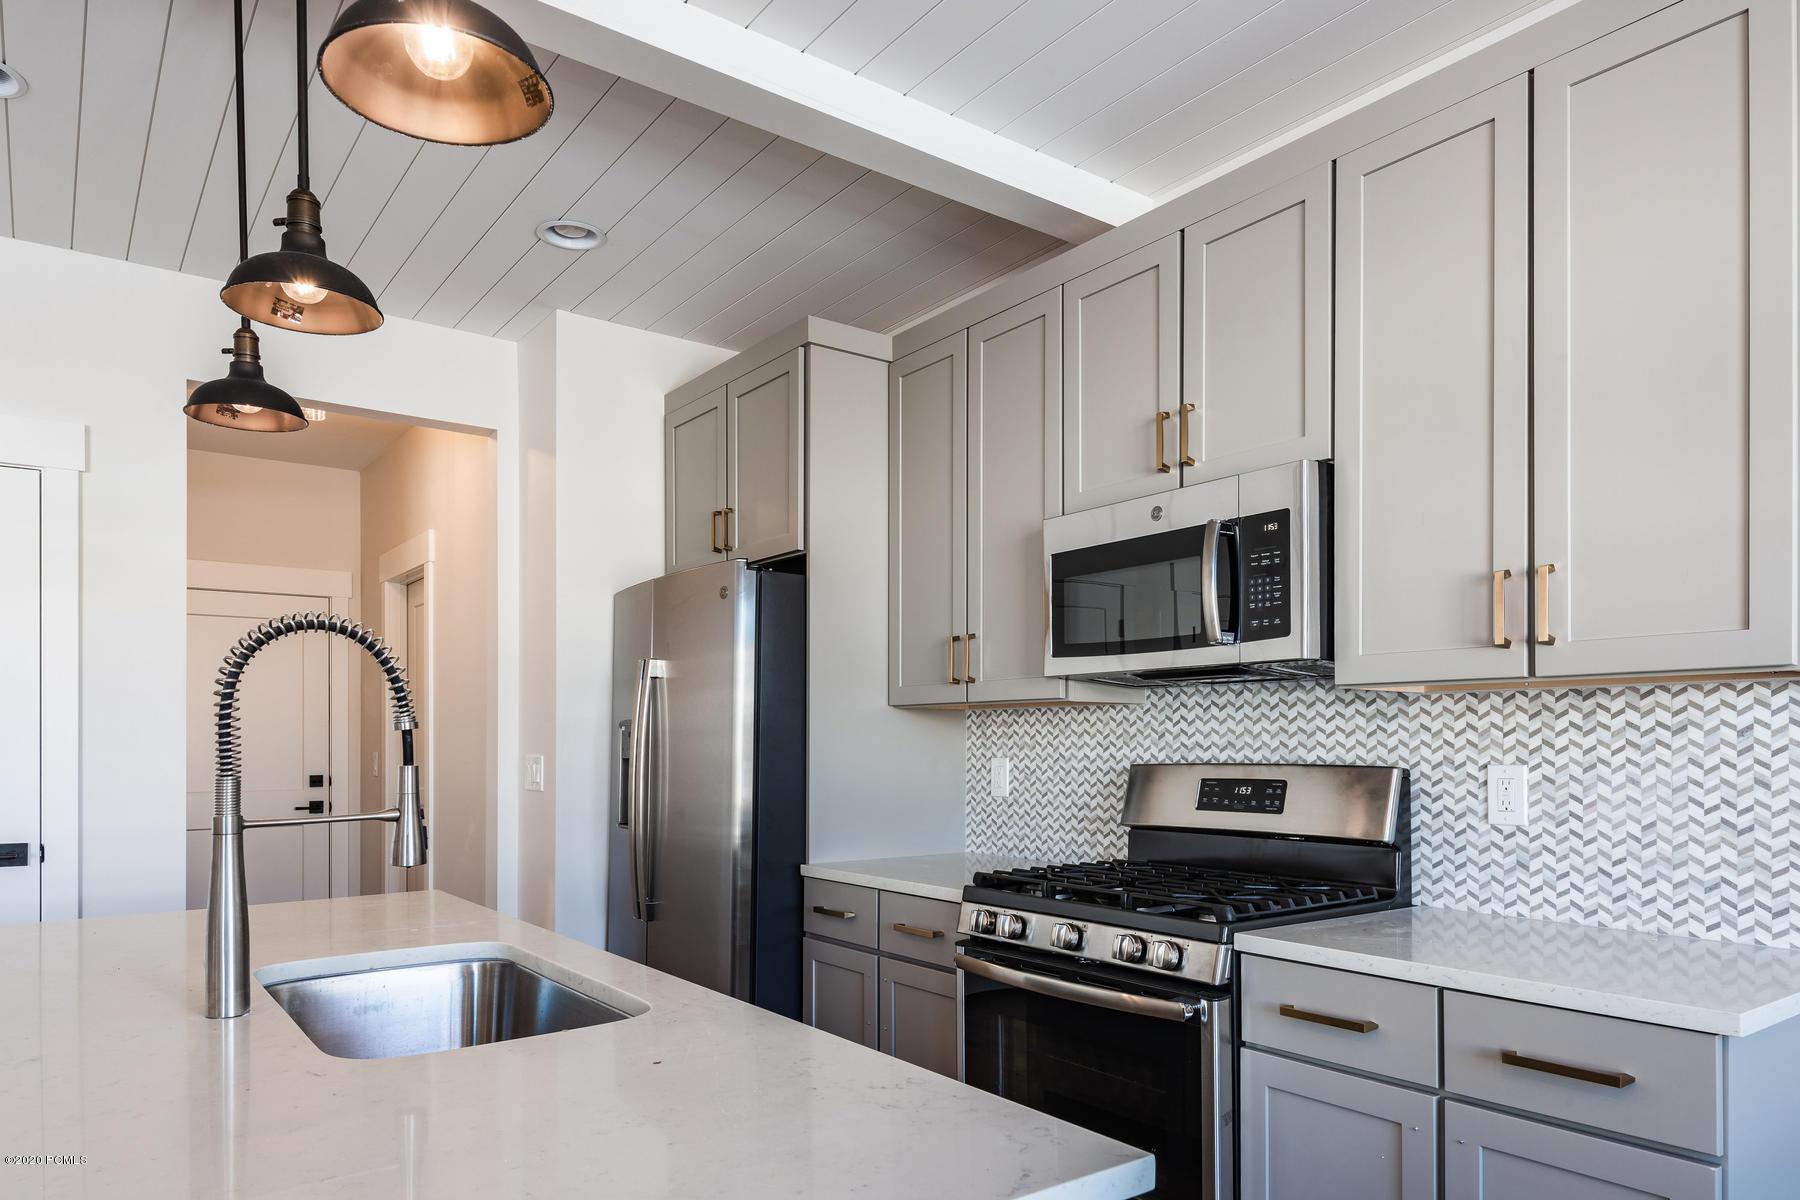 13742 Jordanelle Pkwy #J4, Heber City, Utah 84032, 4 Bedrooms Bedrooms, ,4 BathroomsBathrooms,Condominium,For Sale,Jordanelle Pkwy #J4,20190109112430415765000000